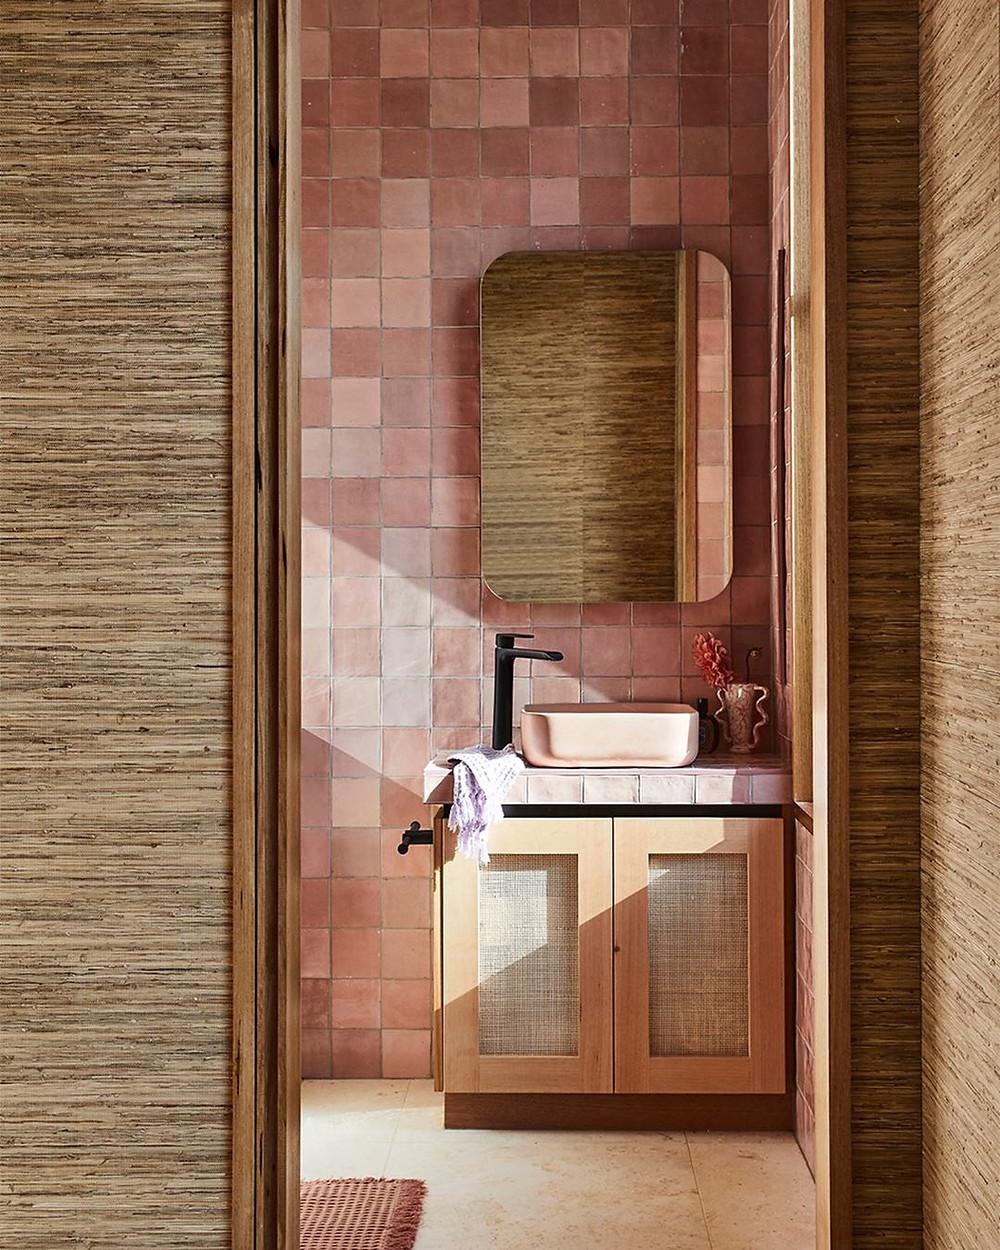 Checkerboard tile bathroom, zellige tile bathroom, terracotta tile bathroom, rattan vanity, grasscloth